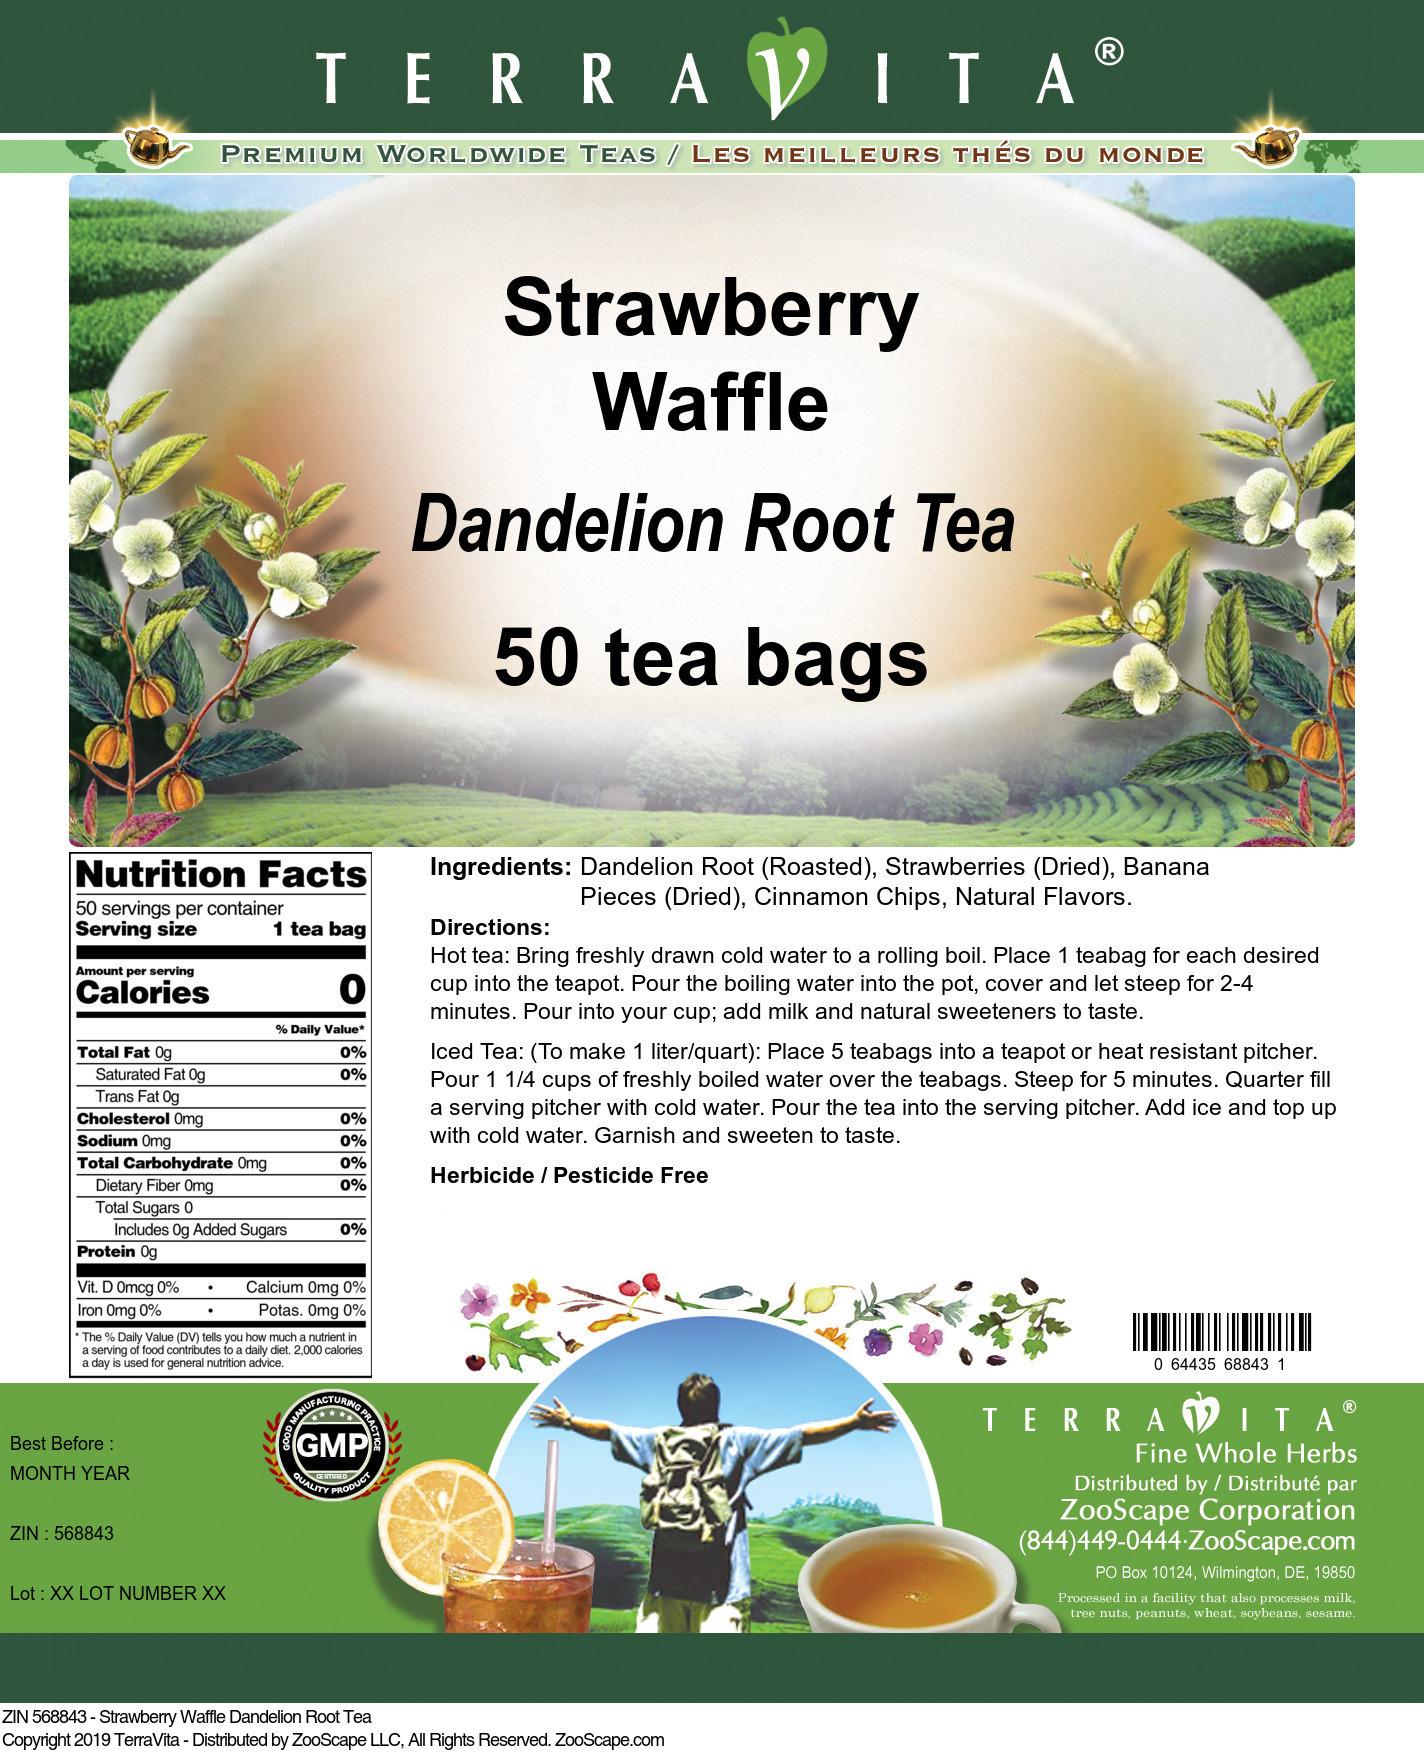 Strawberry Waffle Dandelion Root